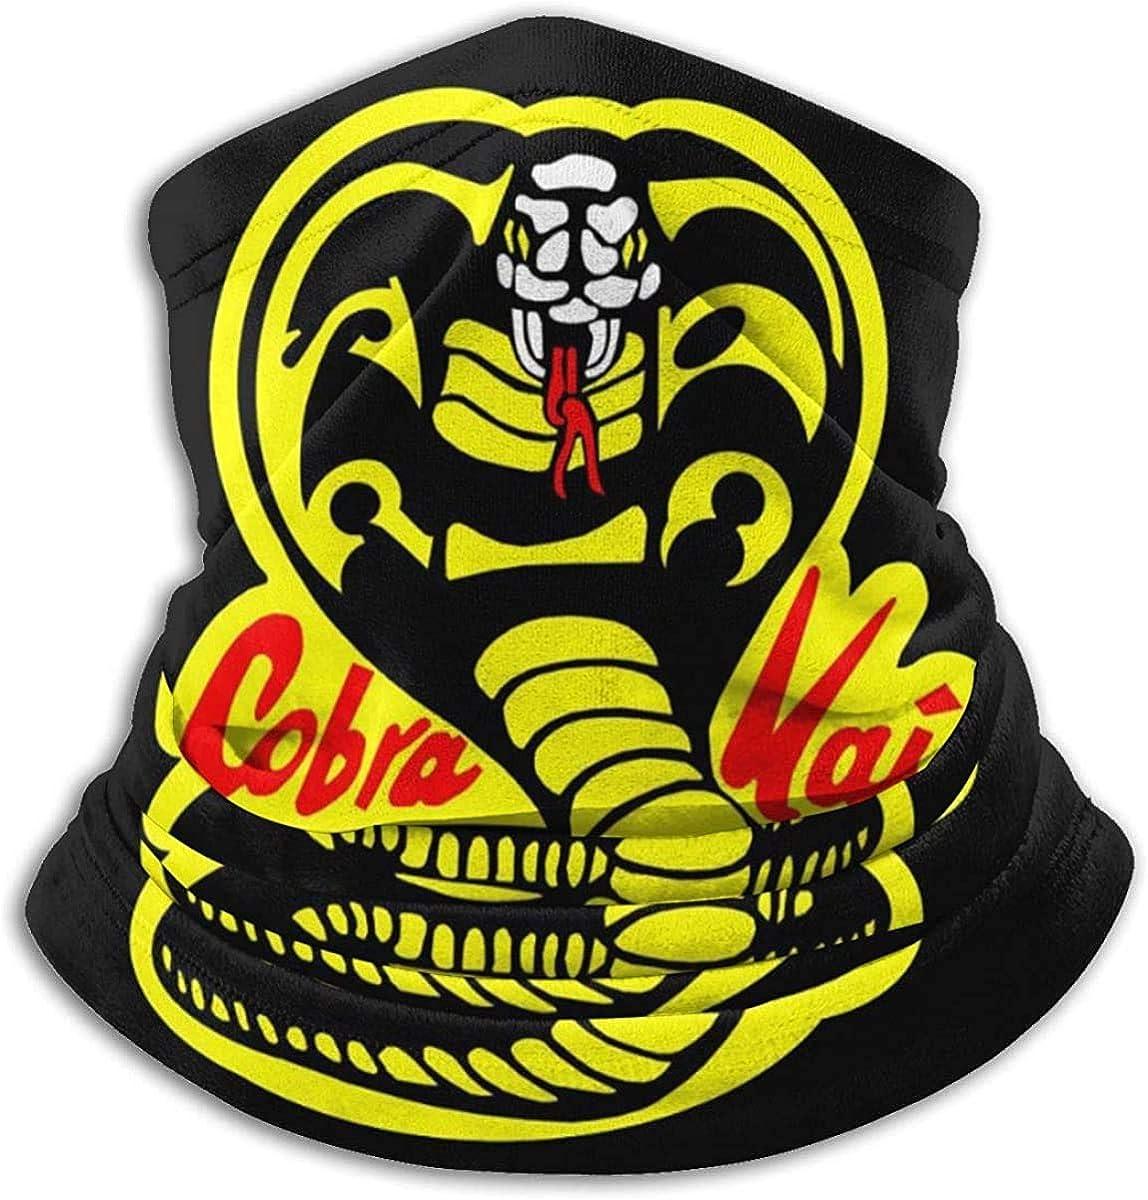 Cobra Kai Scarf Neck Brace Gaiter Face cover, Magic Scarf Headwrap Balaclava Bundle Hair Band Beadband Haze Wind Uv Sun Men Women